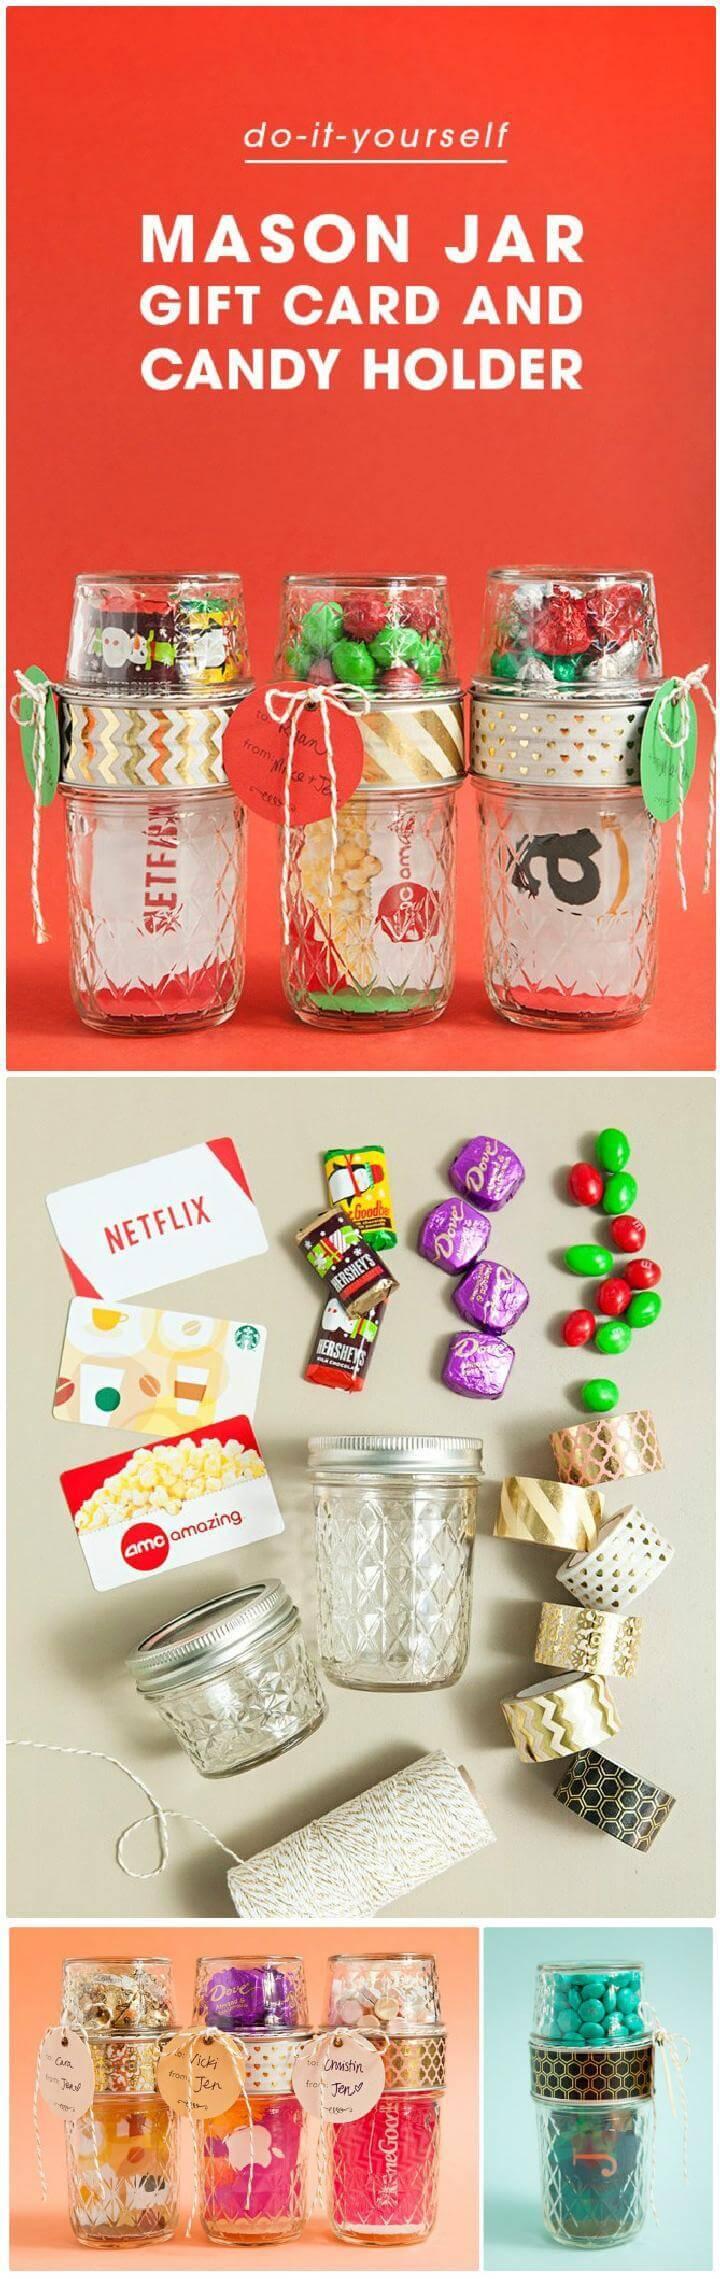 DIY Homemade Mason Jar Gift Card and Candy Holders